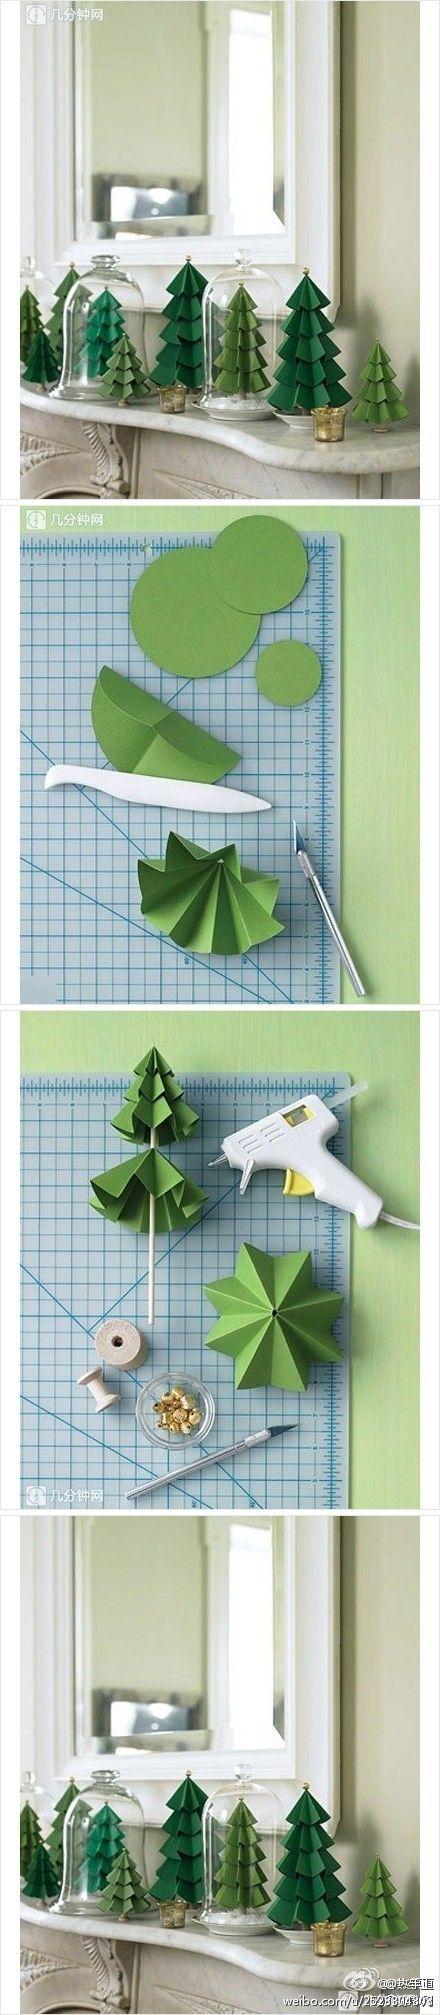 diy | paper xmas tree